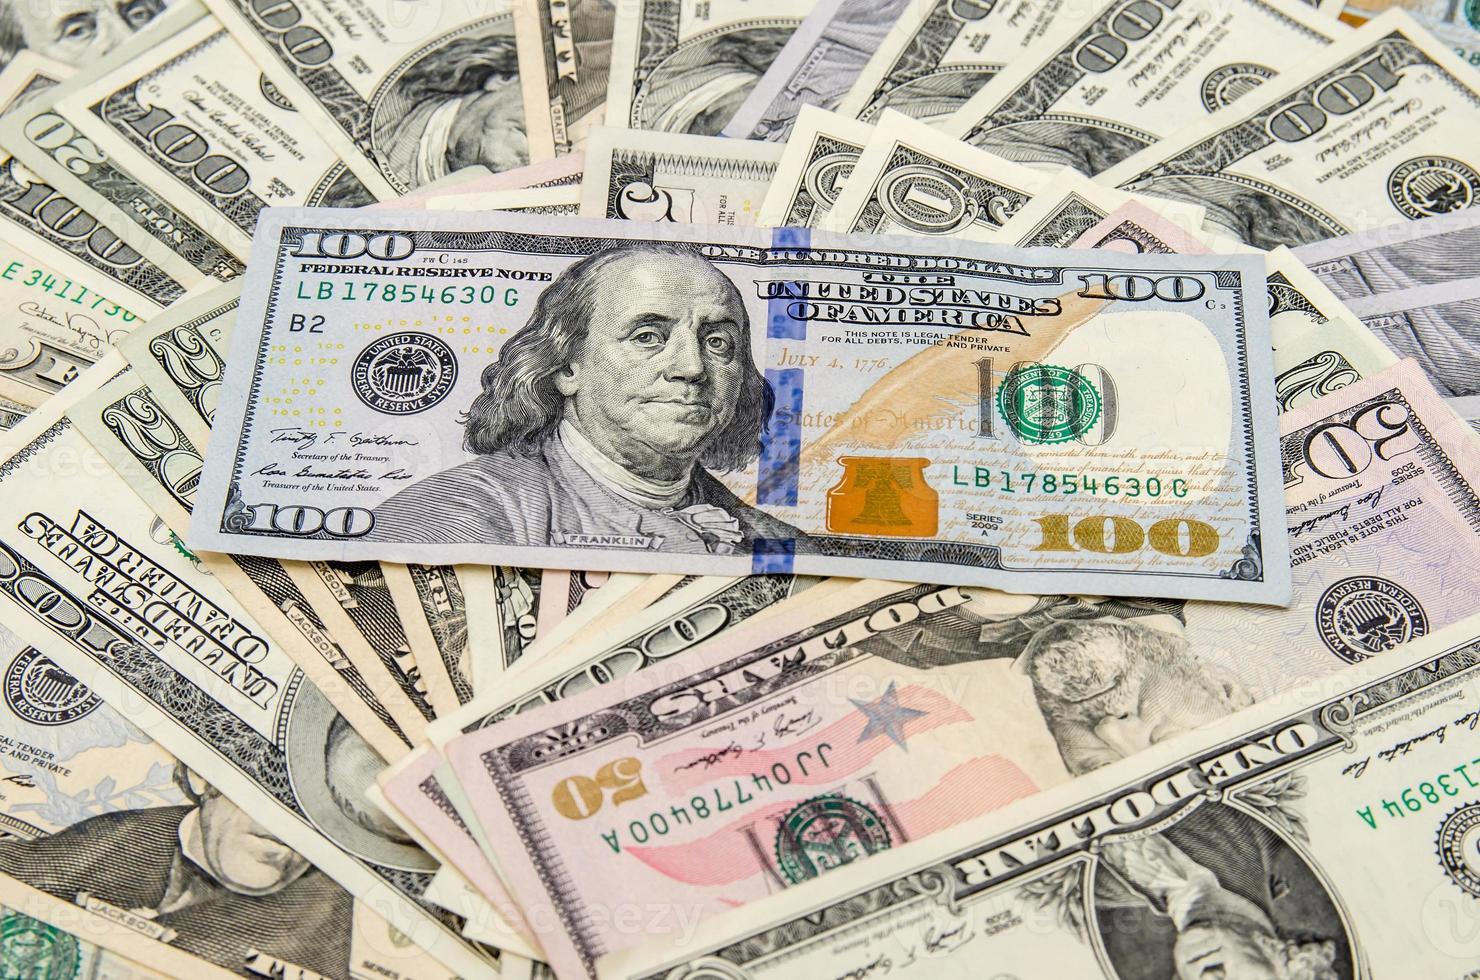 bankbiljetten van dollars als achtergrond foto